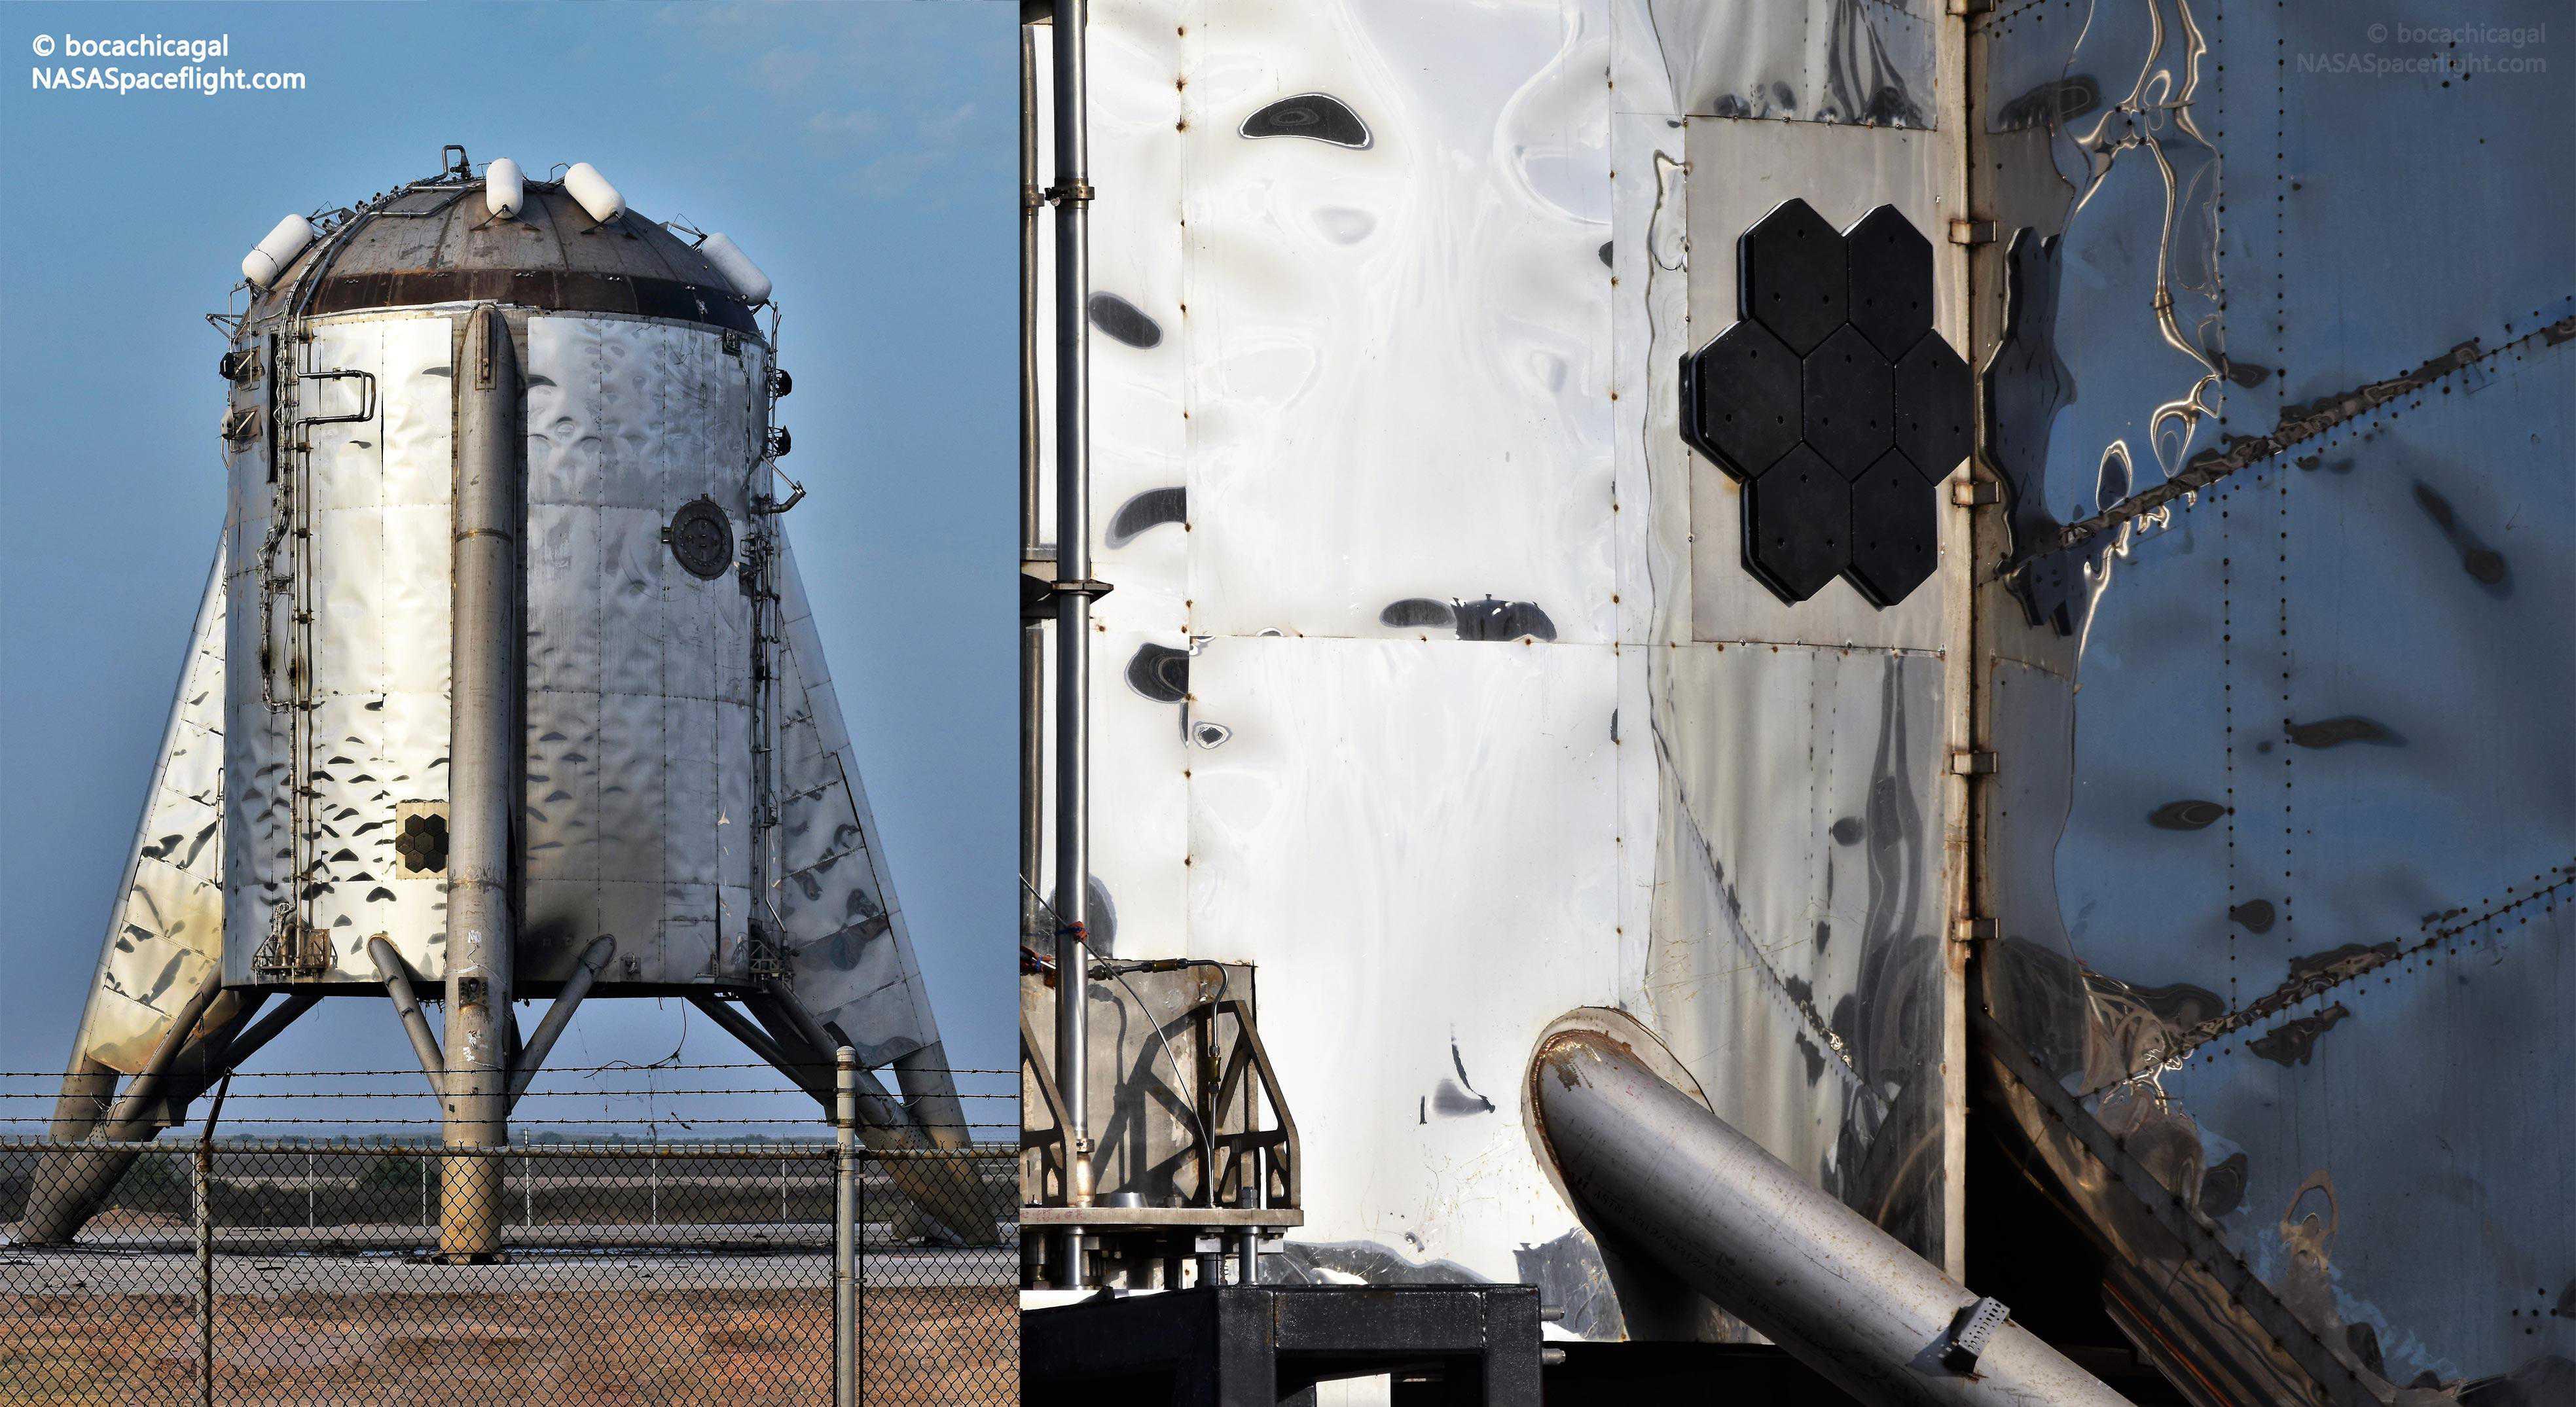 Boca Chica Starhopper post hop 082819 (NASASpaceflight – bocachicagal) Starship tiles 1 (c)